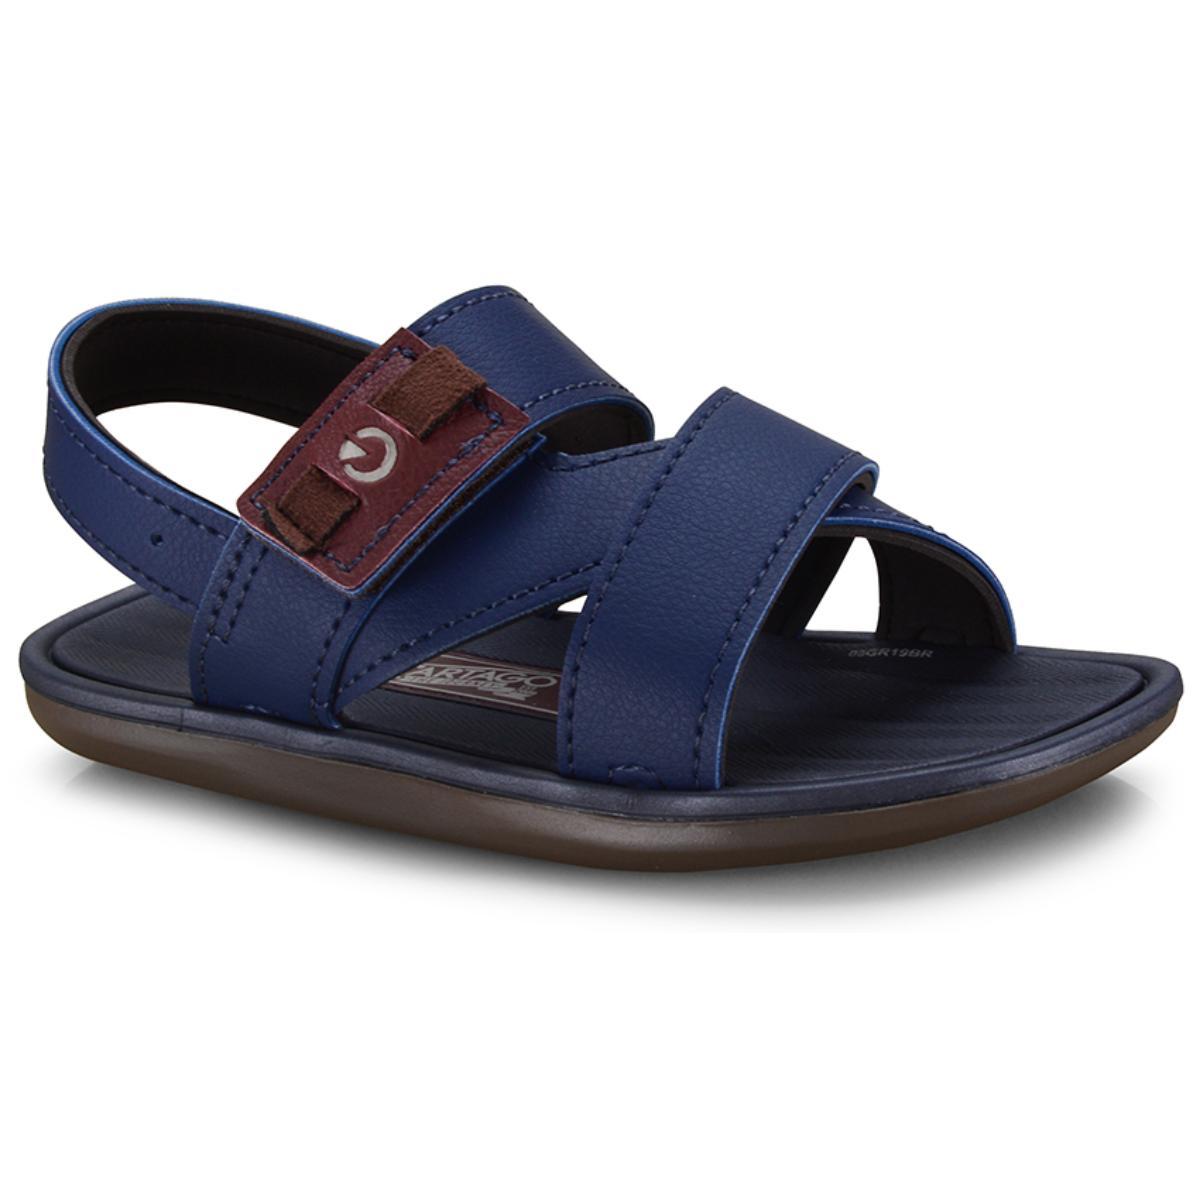 Sandália Masc Infantil Grendene 11531 21181 Cartago Mali xi Sand Marrom/azul